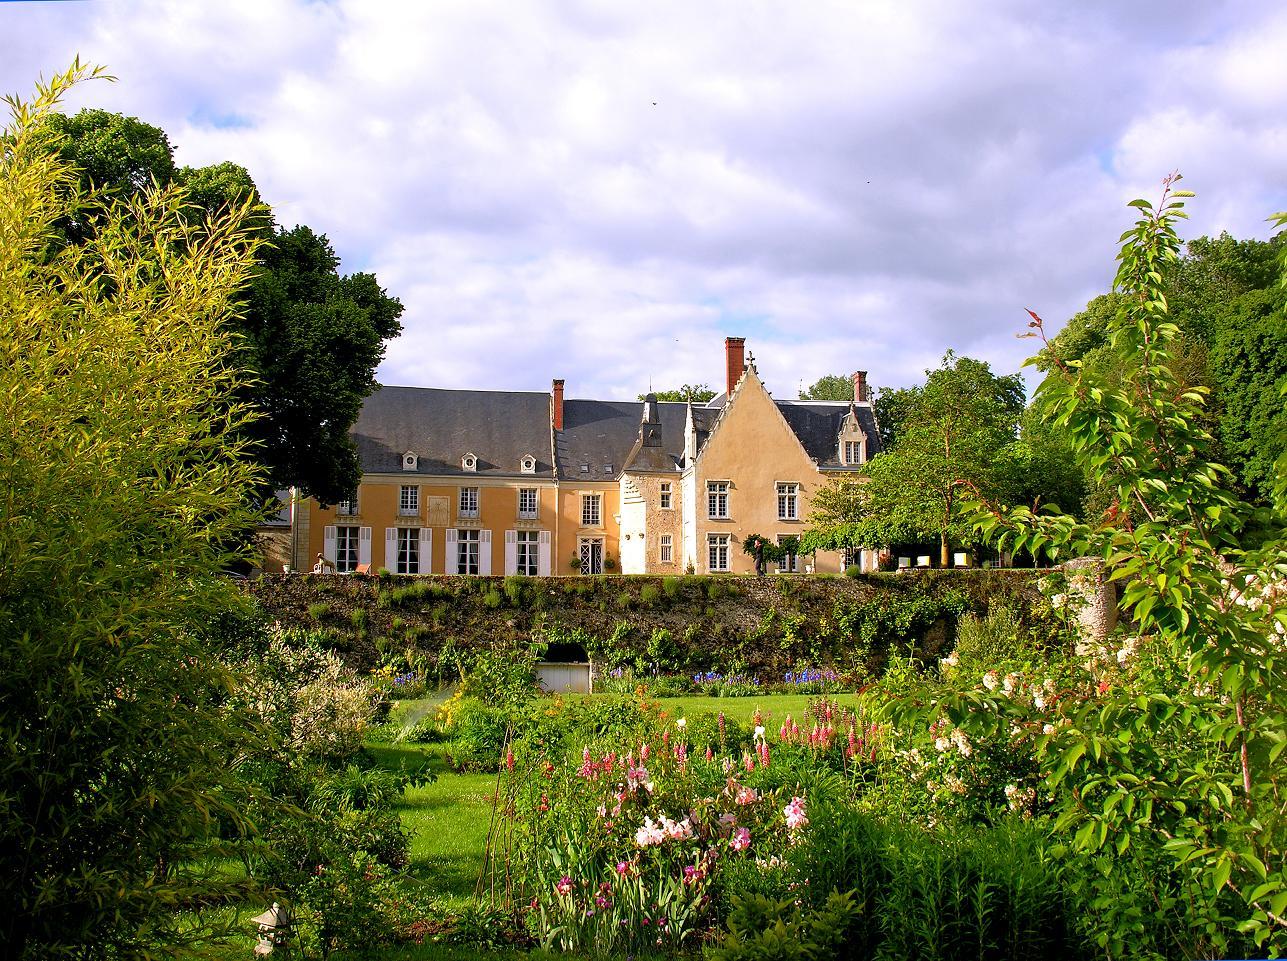 garden-view-chateau-barre-hotel-vanssay-loire-france